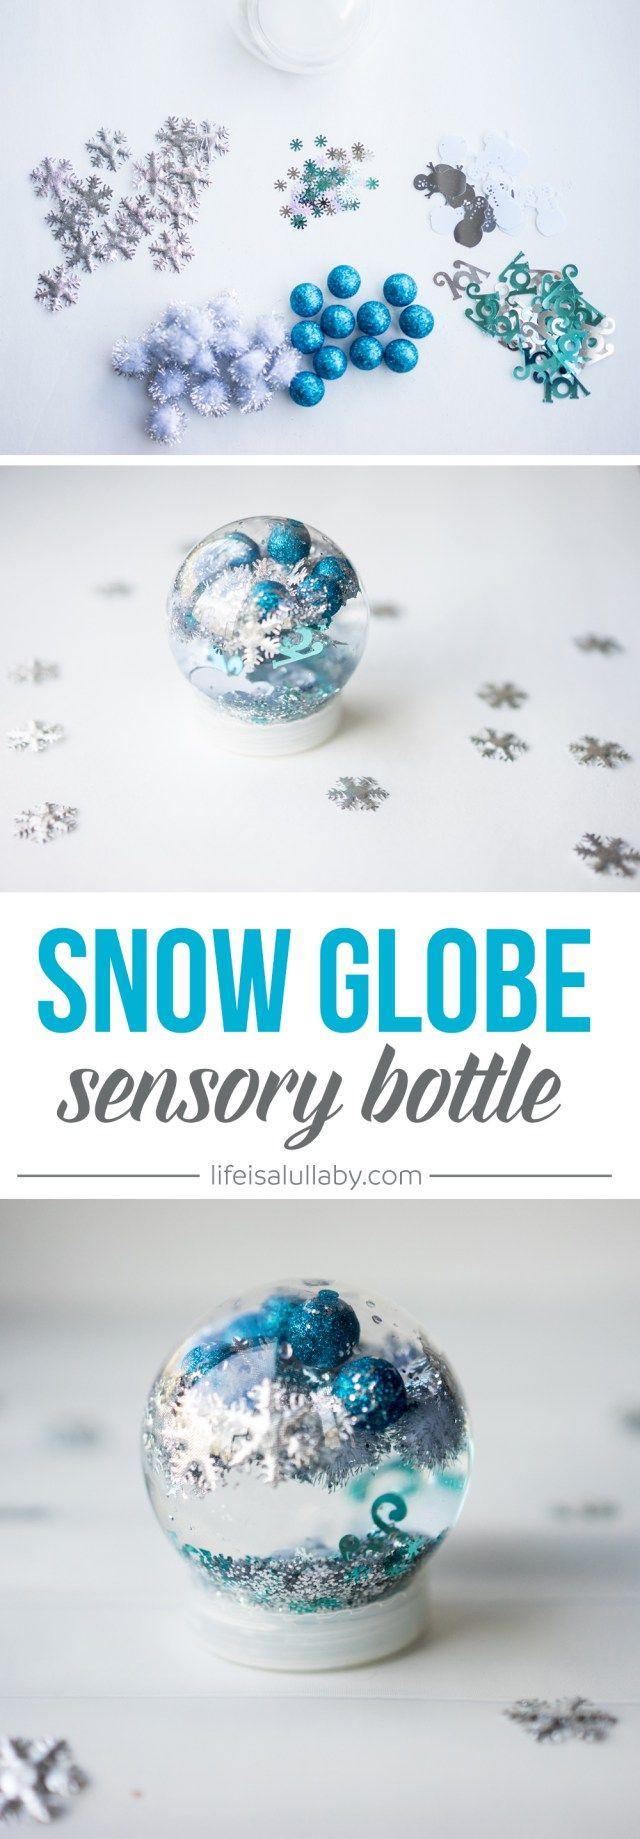 Snow Globe Christmas Sensory Bottle